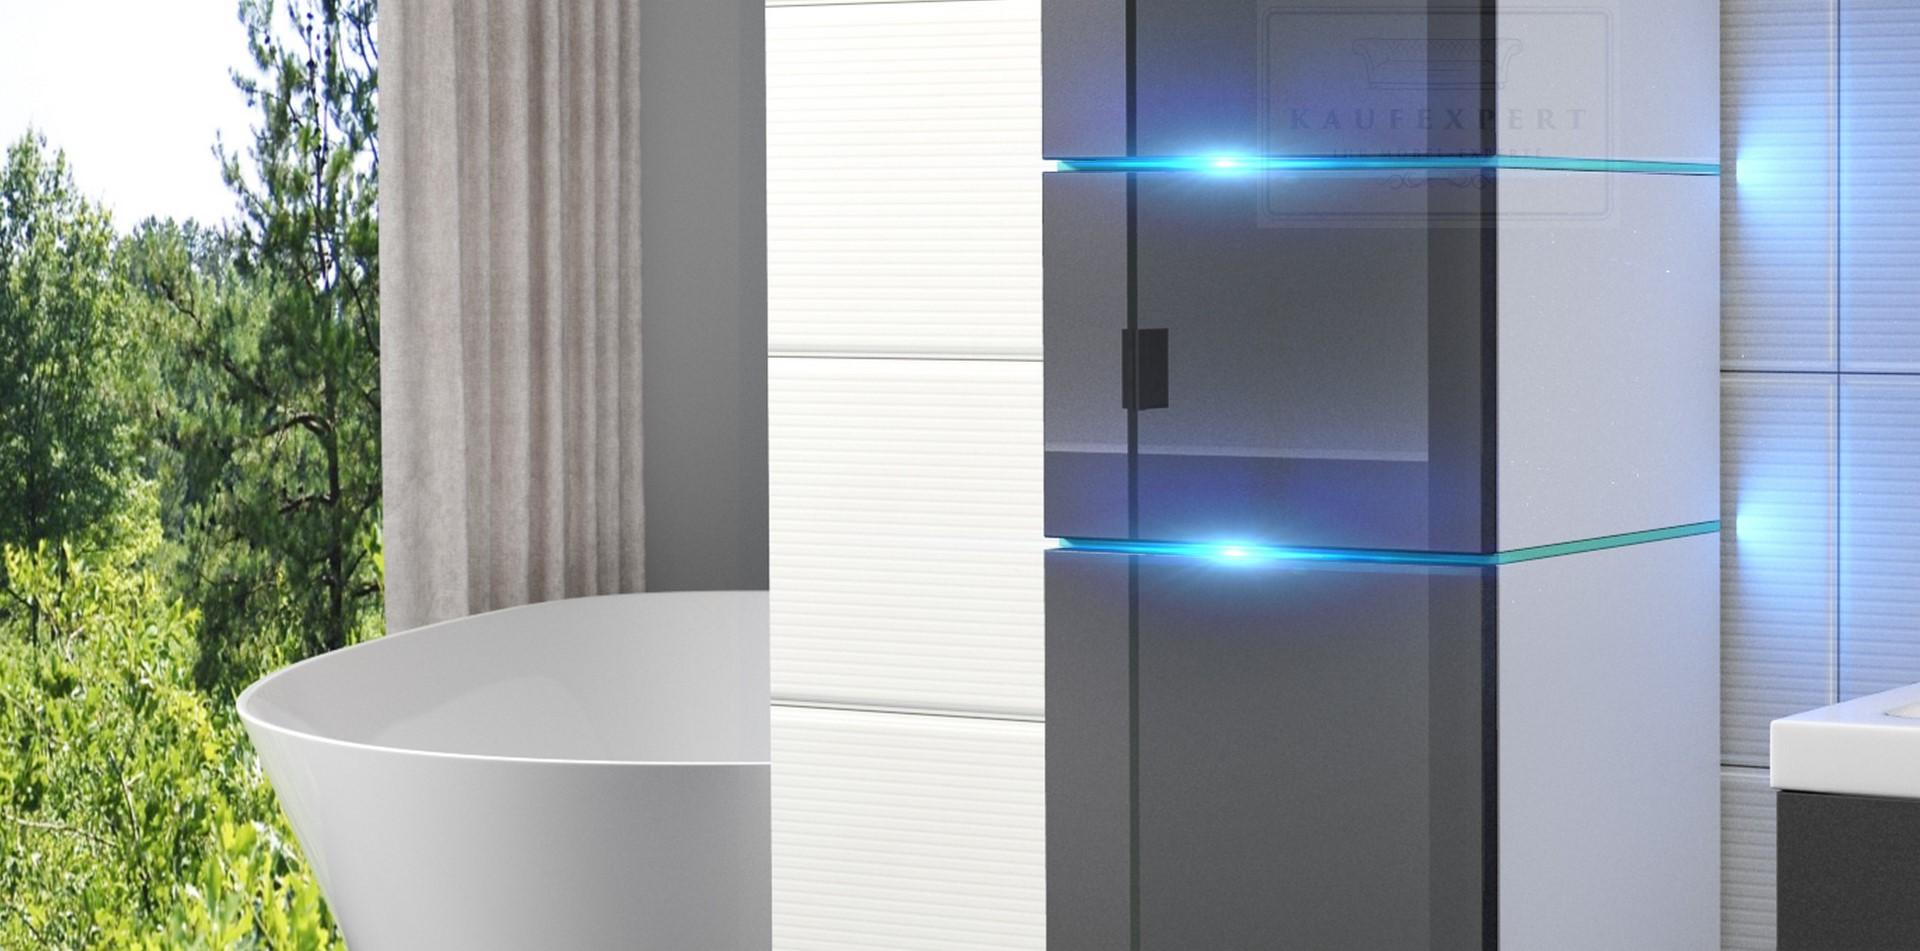 badm bel set ledox 170 cm grau hochglanz wei led beleuchtung badezimmerm bel ebay. Black Bedroom Furniture Sets. Home Design Ideas